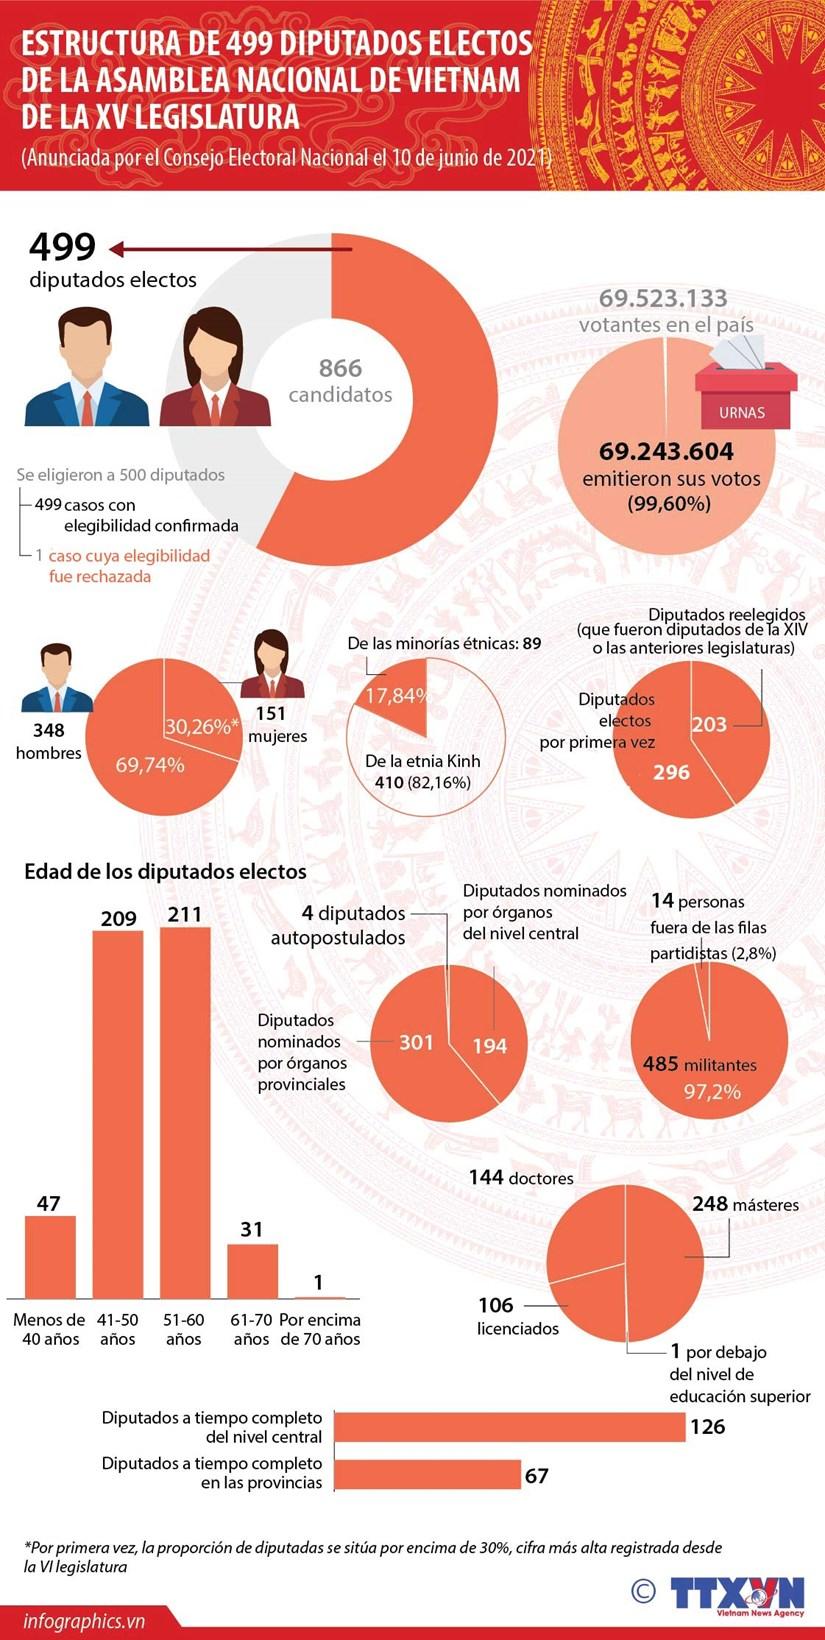 Estructura de diputados electos del Parlamento de Vietnam de XV legislatura hinh anh 1